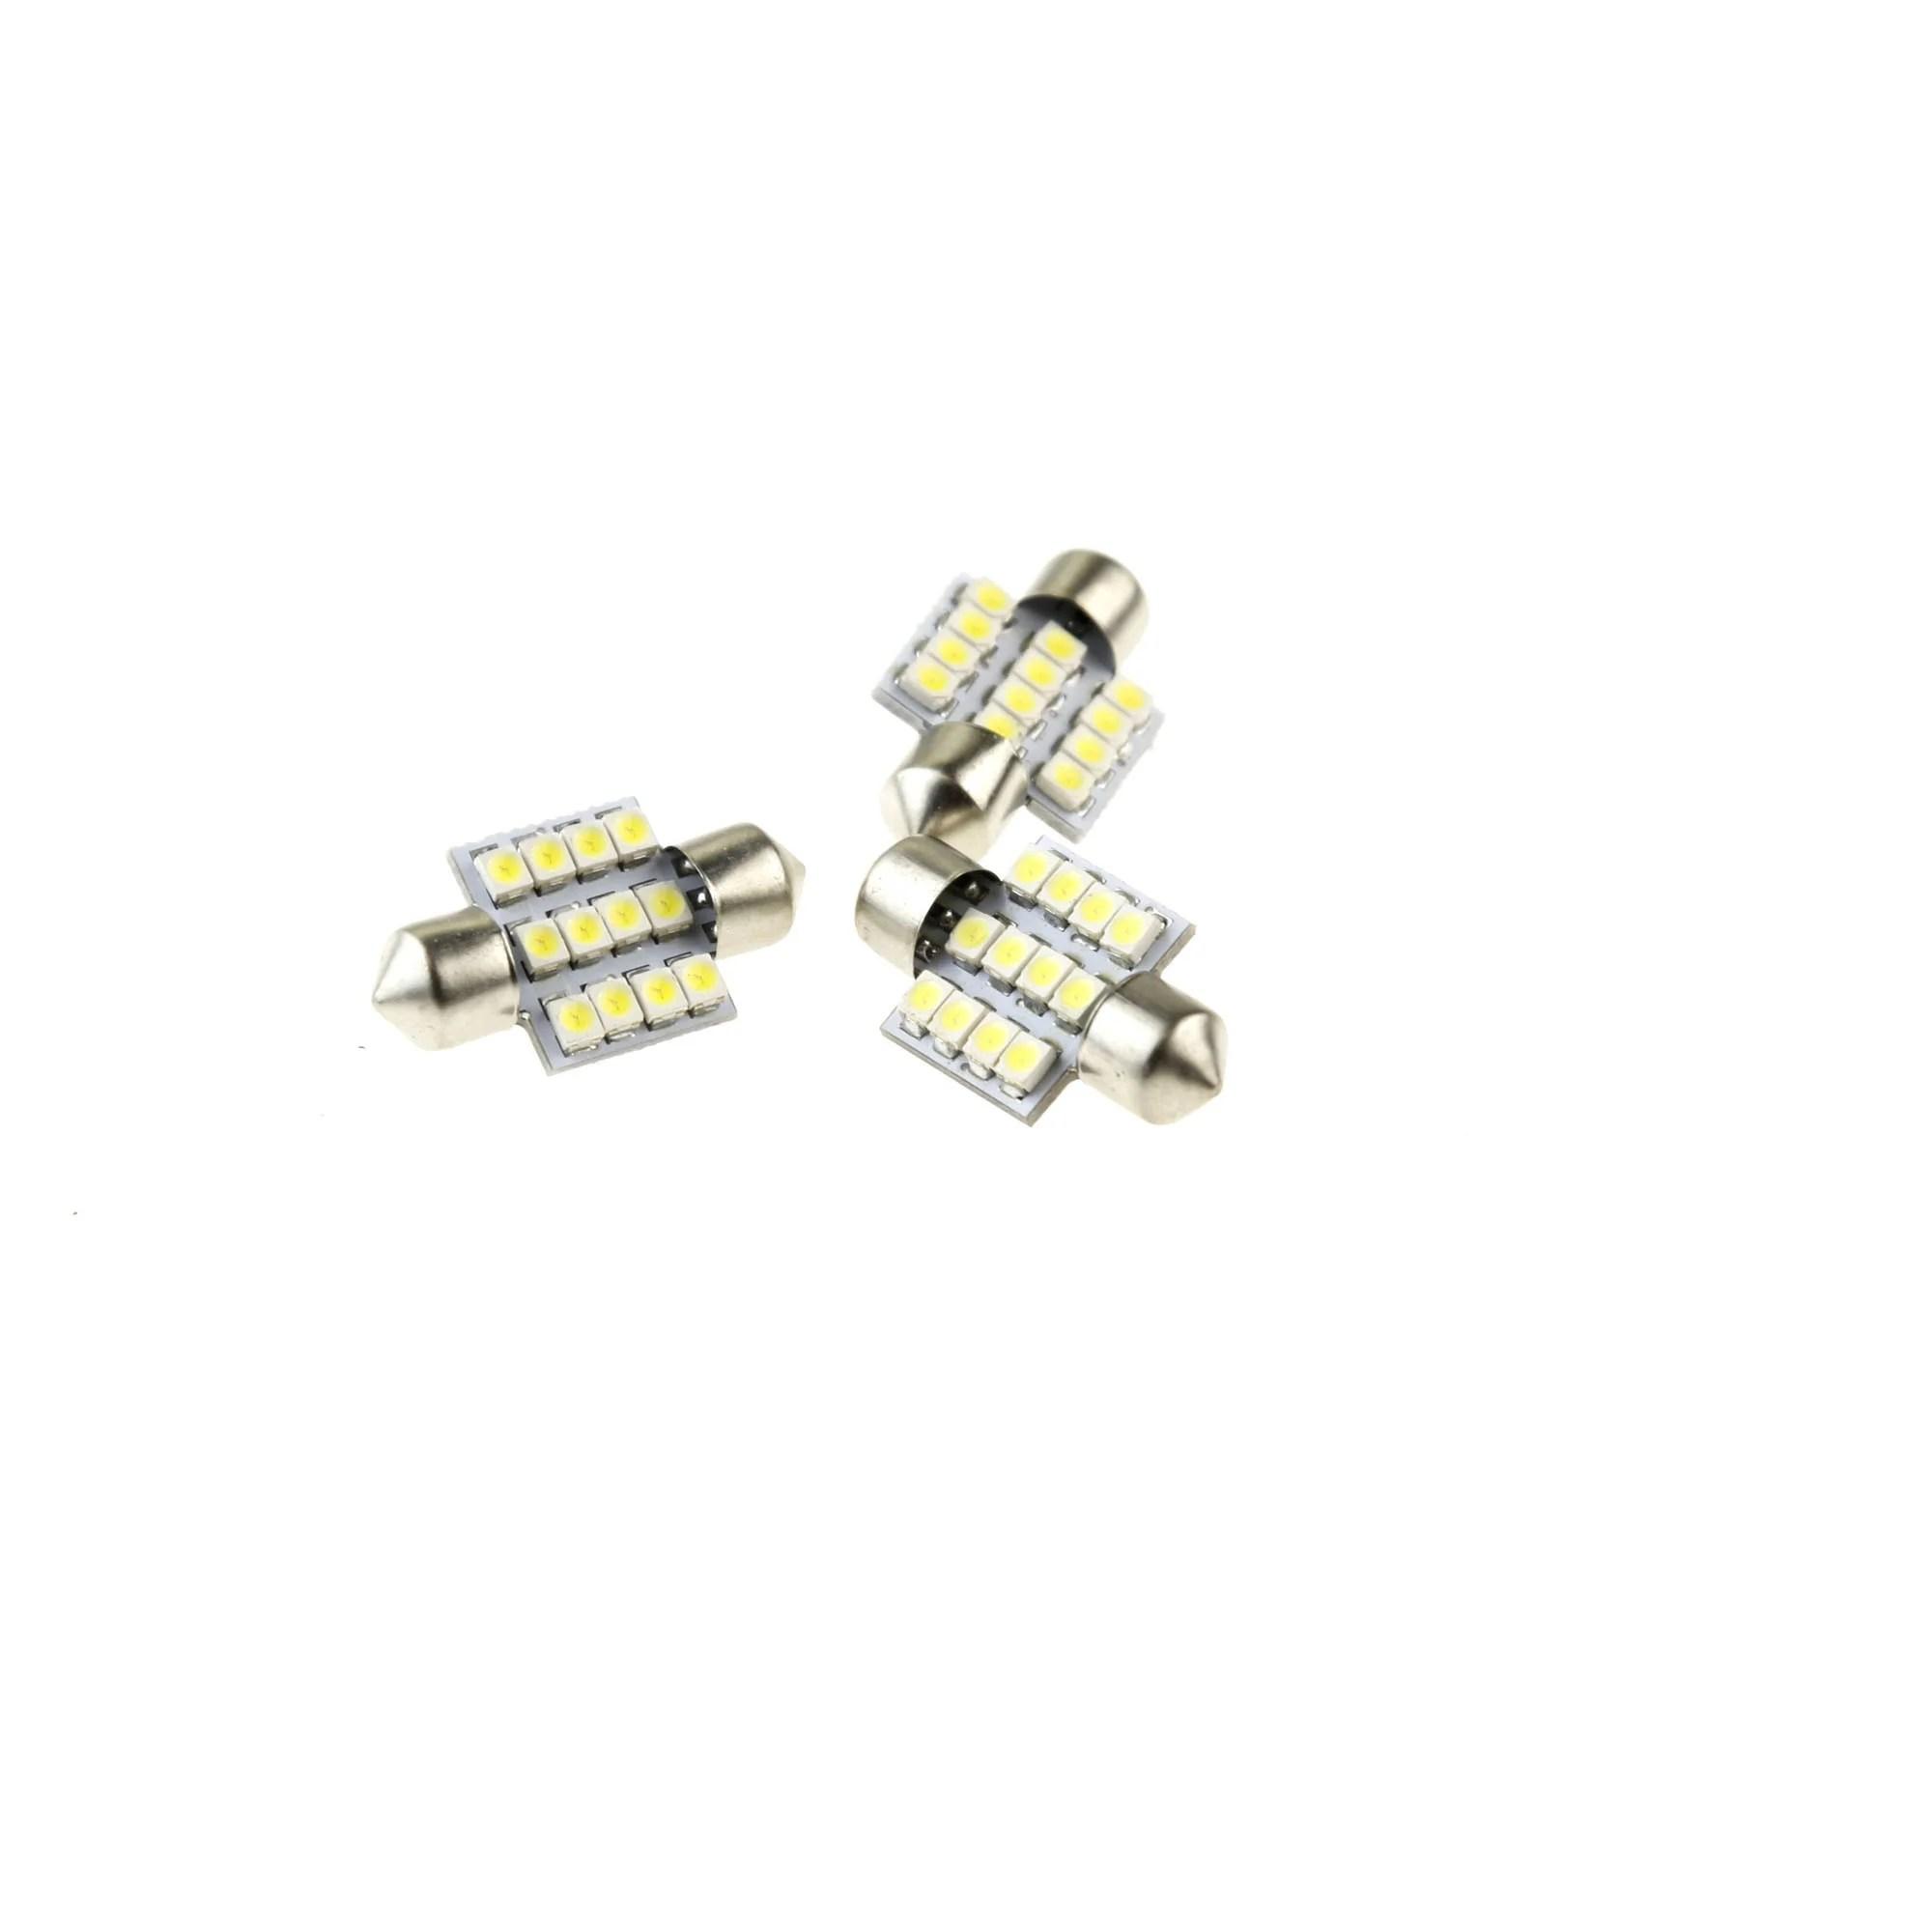 hight resolution of interior lighting subaru wrx led lights fastwrx com subaru wrx shifter subaru wrx interior illumination wiring